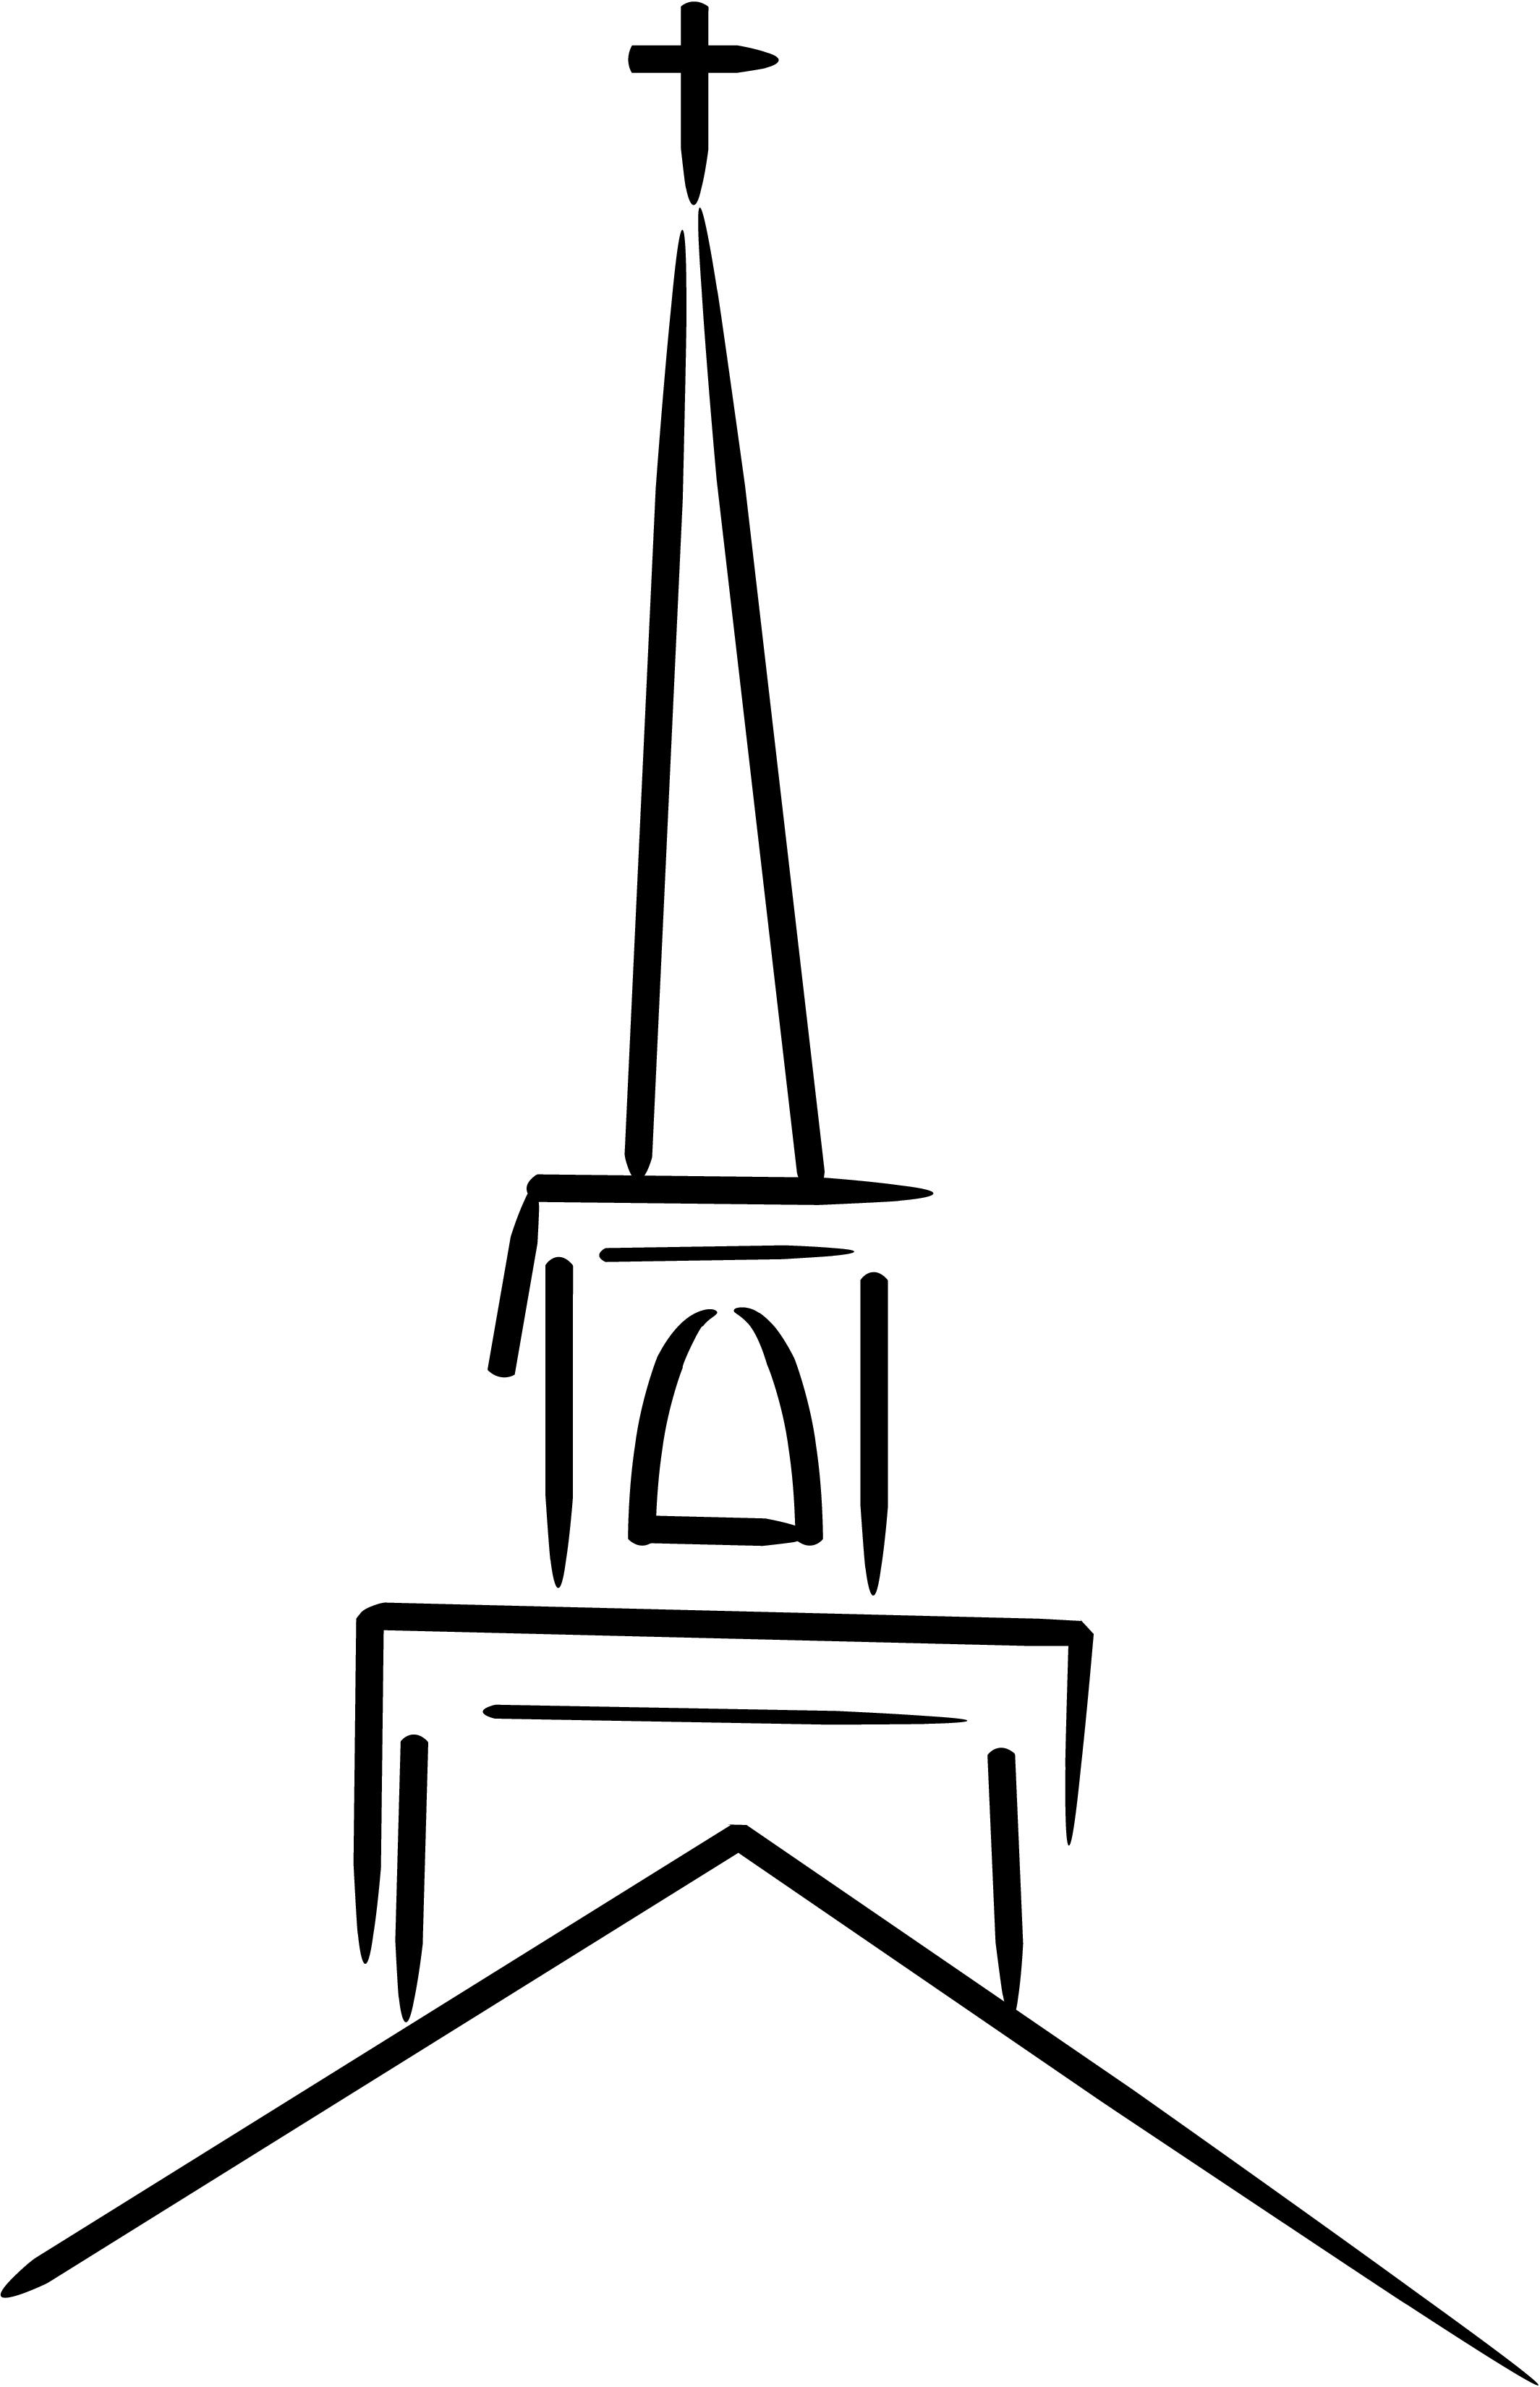 Sketch clipart church Sketch Cross  sketch Church